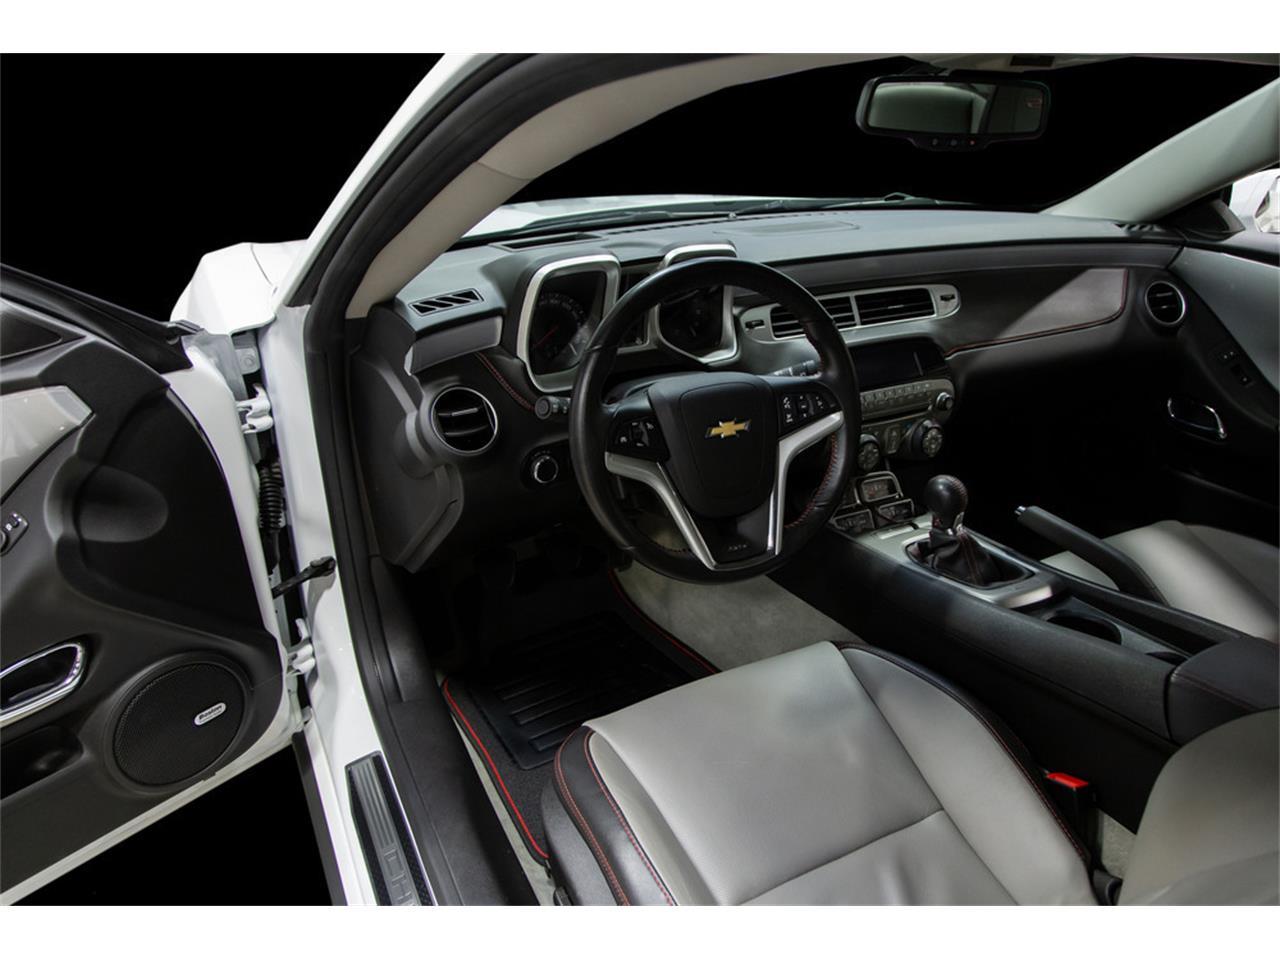 2012 Chevrolet Camaro (CC-1258691) for sale in Las Vegas, Nevada